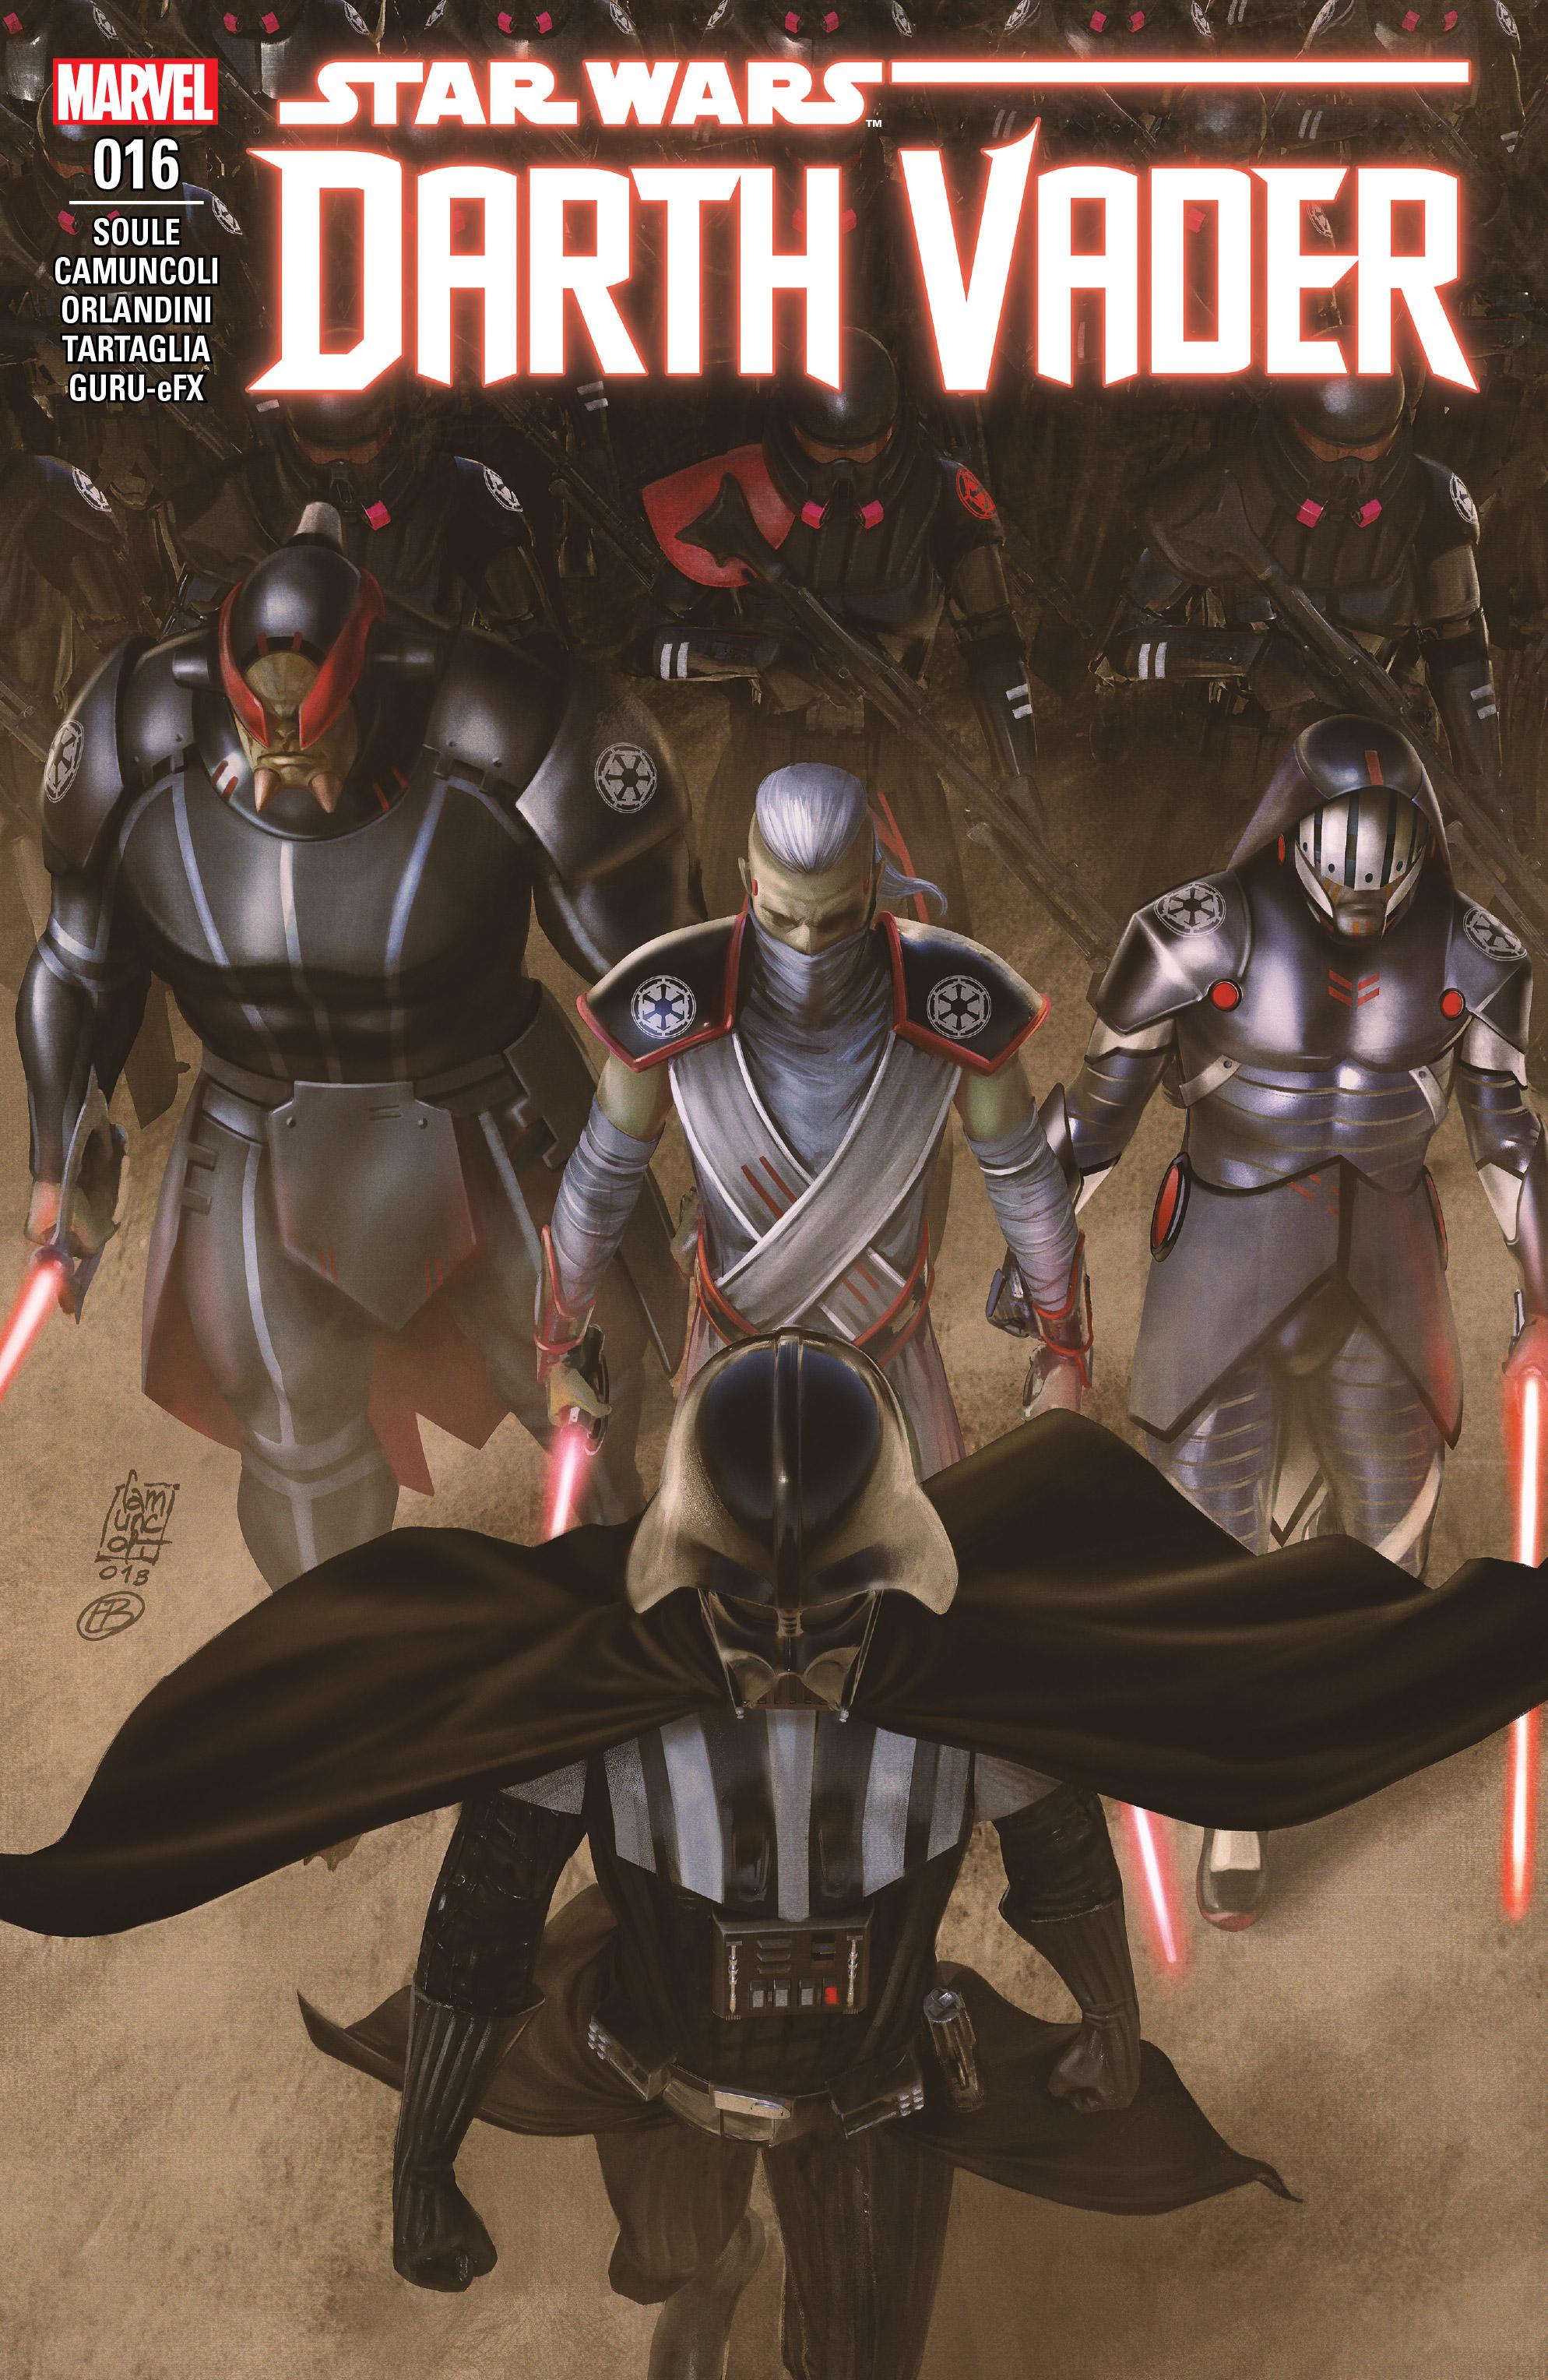 Dark Vador: Seigneur Noir des Sith 16: Mers de Feu 4